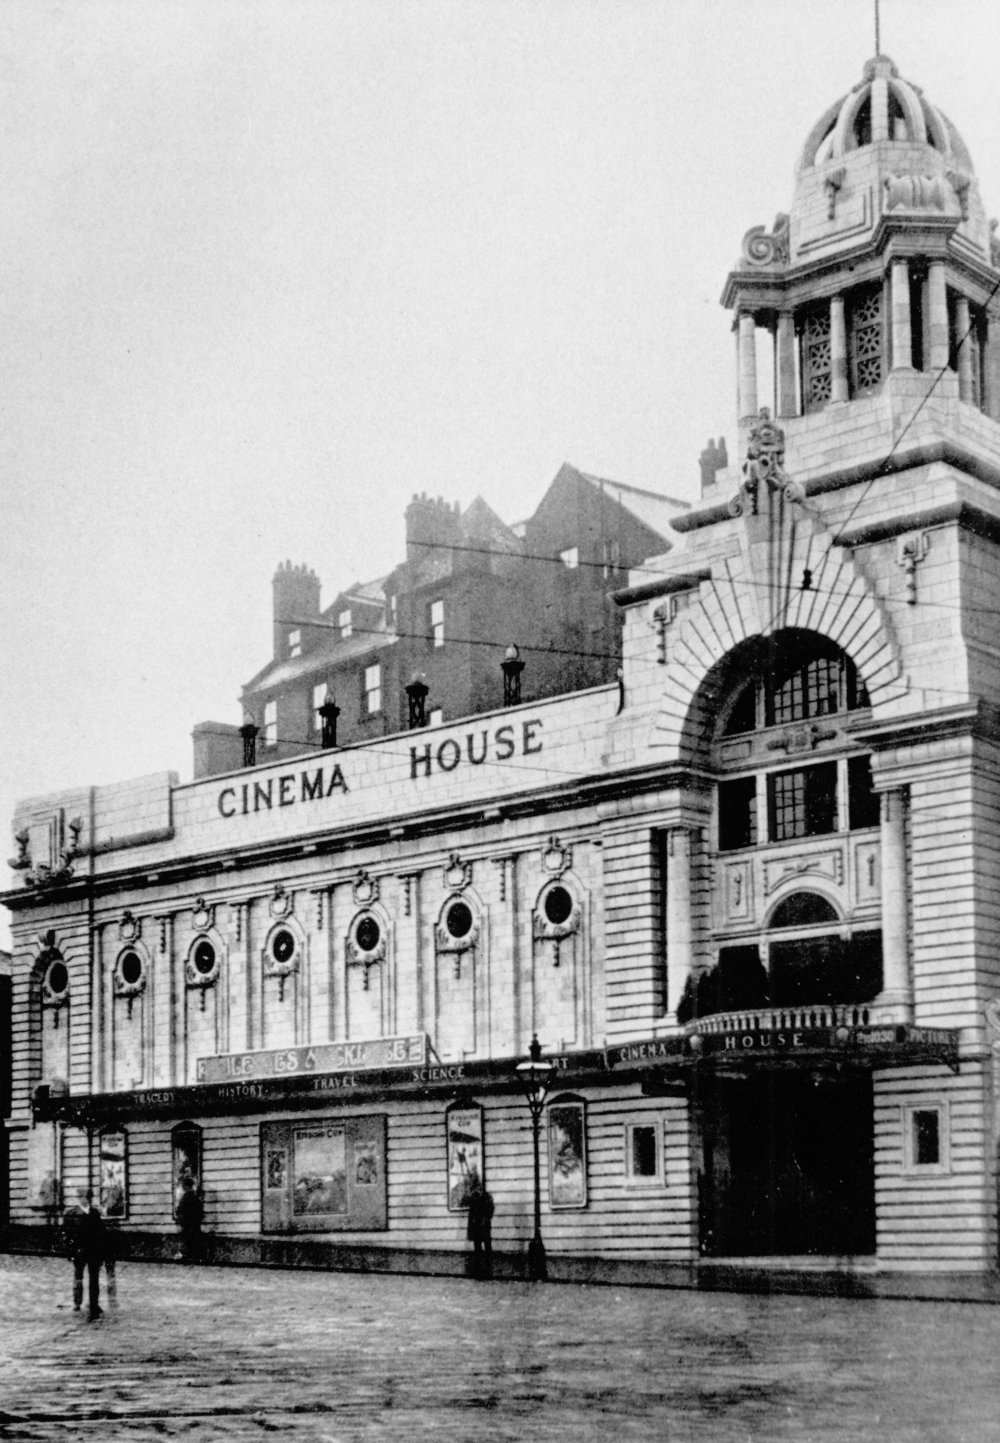 The Cinema House, Sheffield, 1914